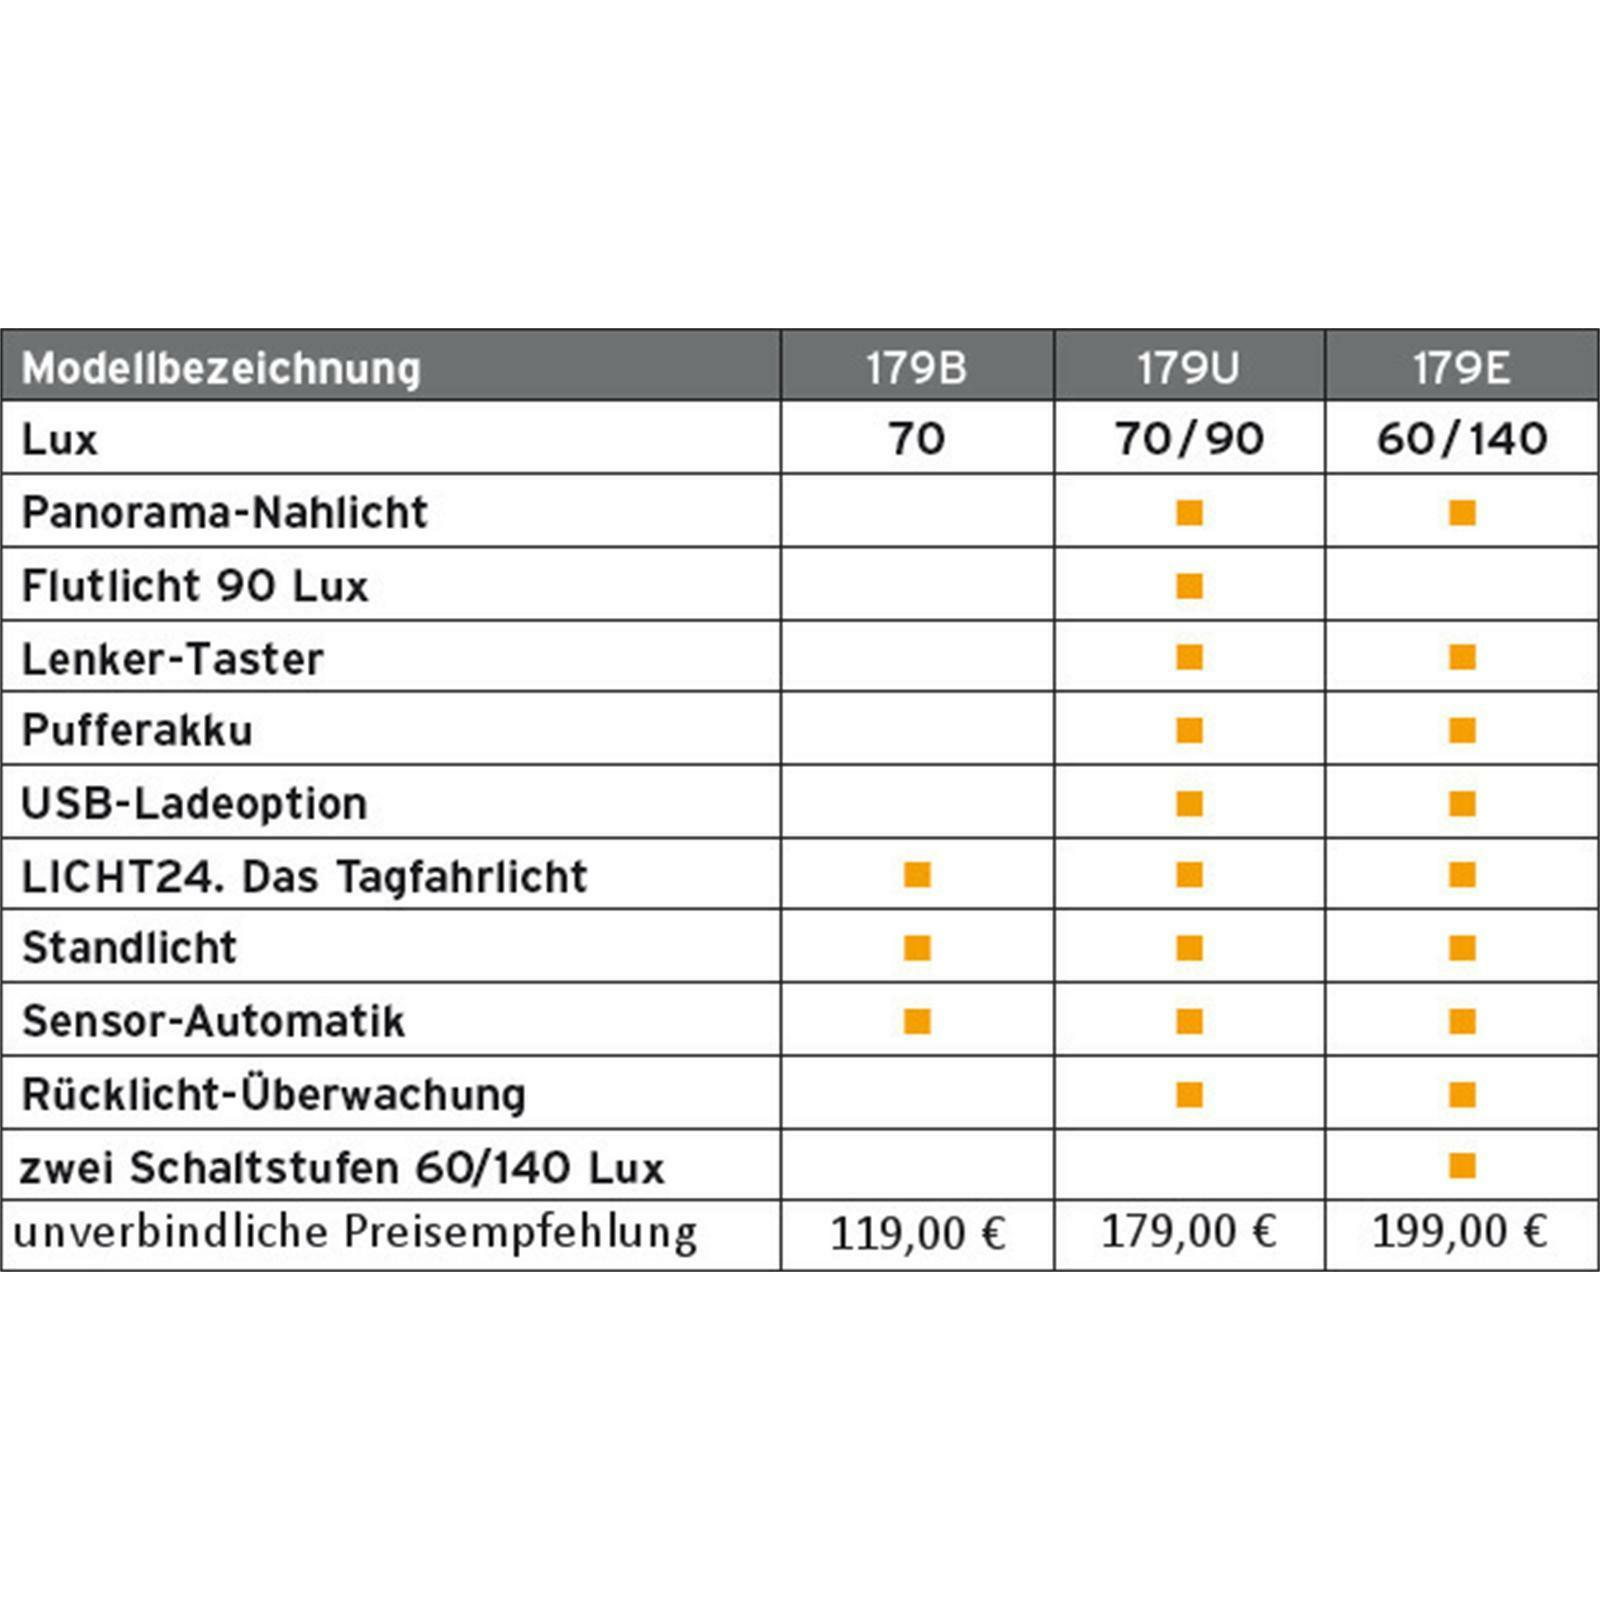 Busch & - Müller LUMOTEC IQ2 LUXOS B - & 179B Dynamo Fahrrad Licht Lampe 70 Lux 483587